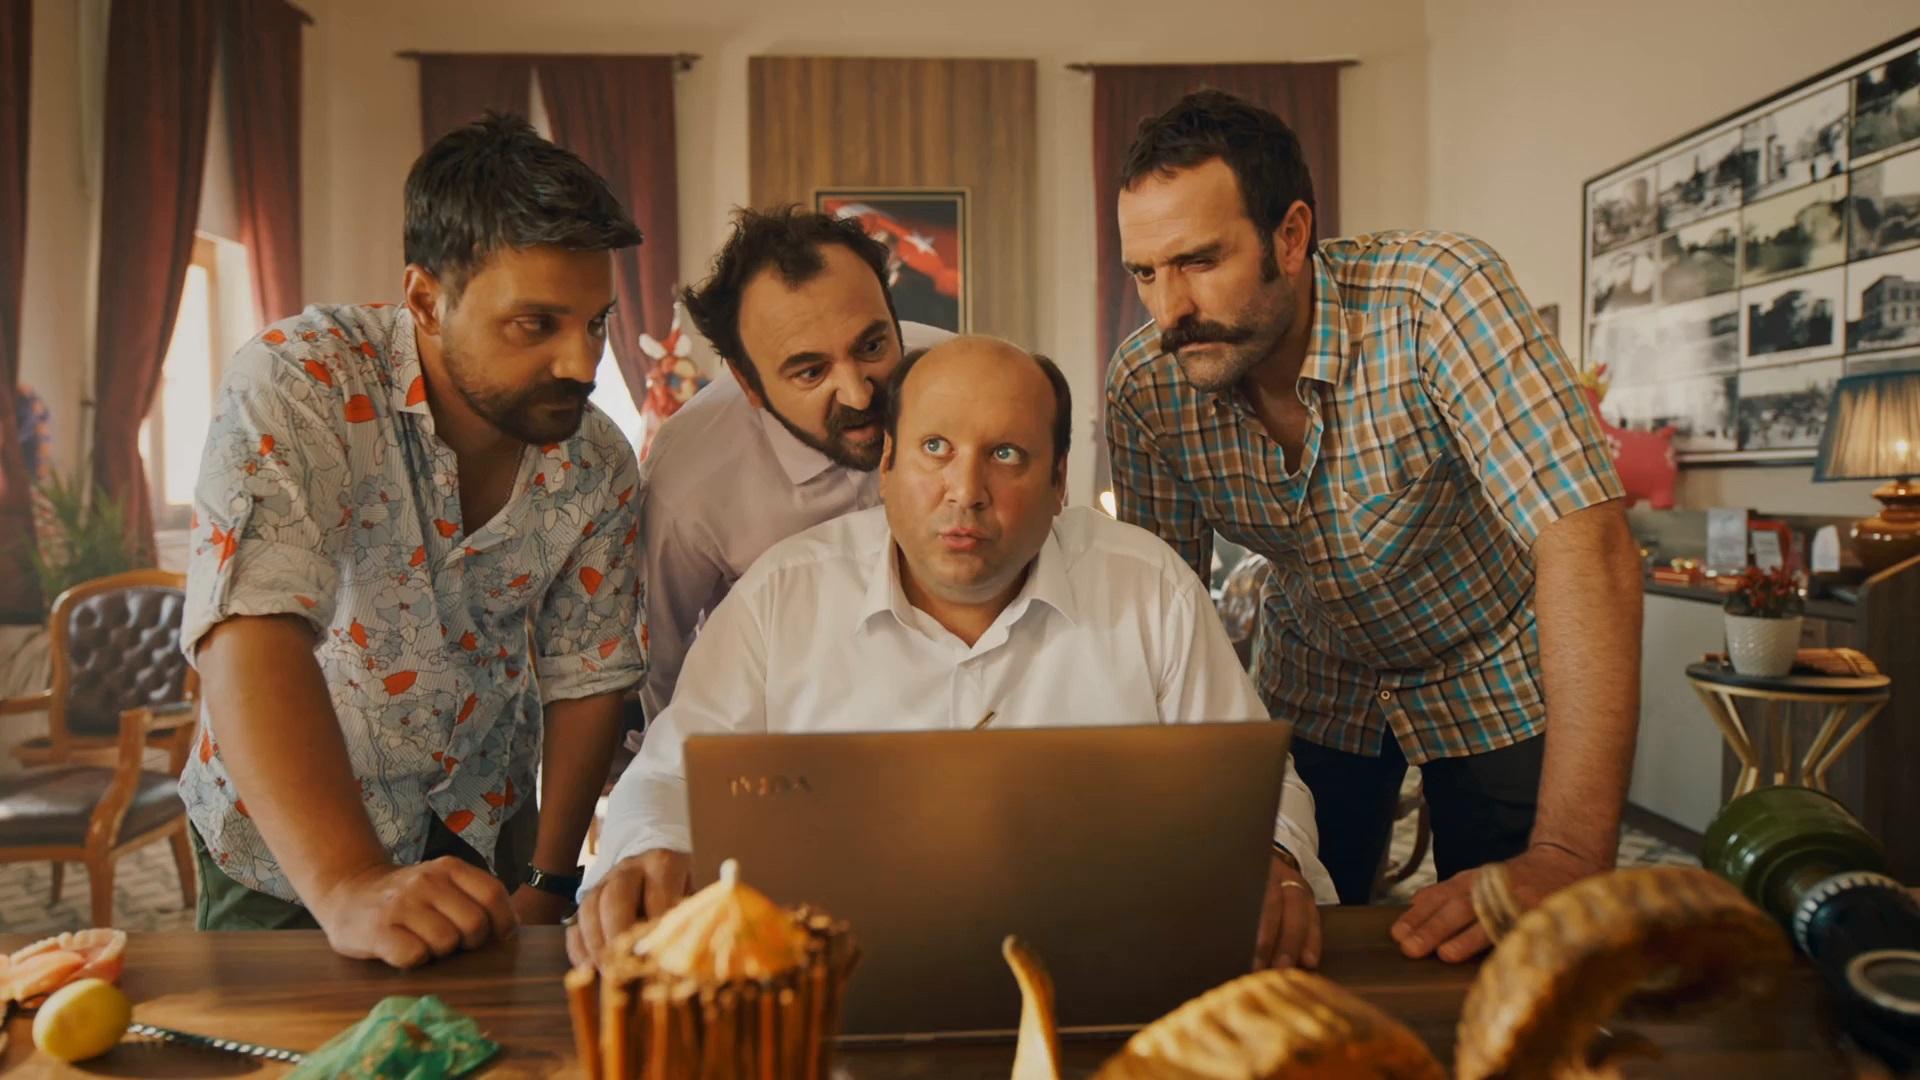 Kırk Yalan | 2020 | Yerli Film | WEB-DL | XviD | Sansürsüz | 720p - 1080p - m720p - m1080p | WEB-DL | Tek Link